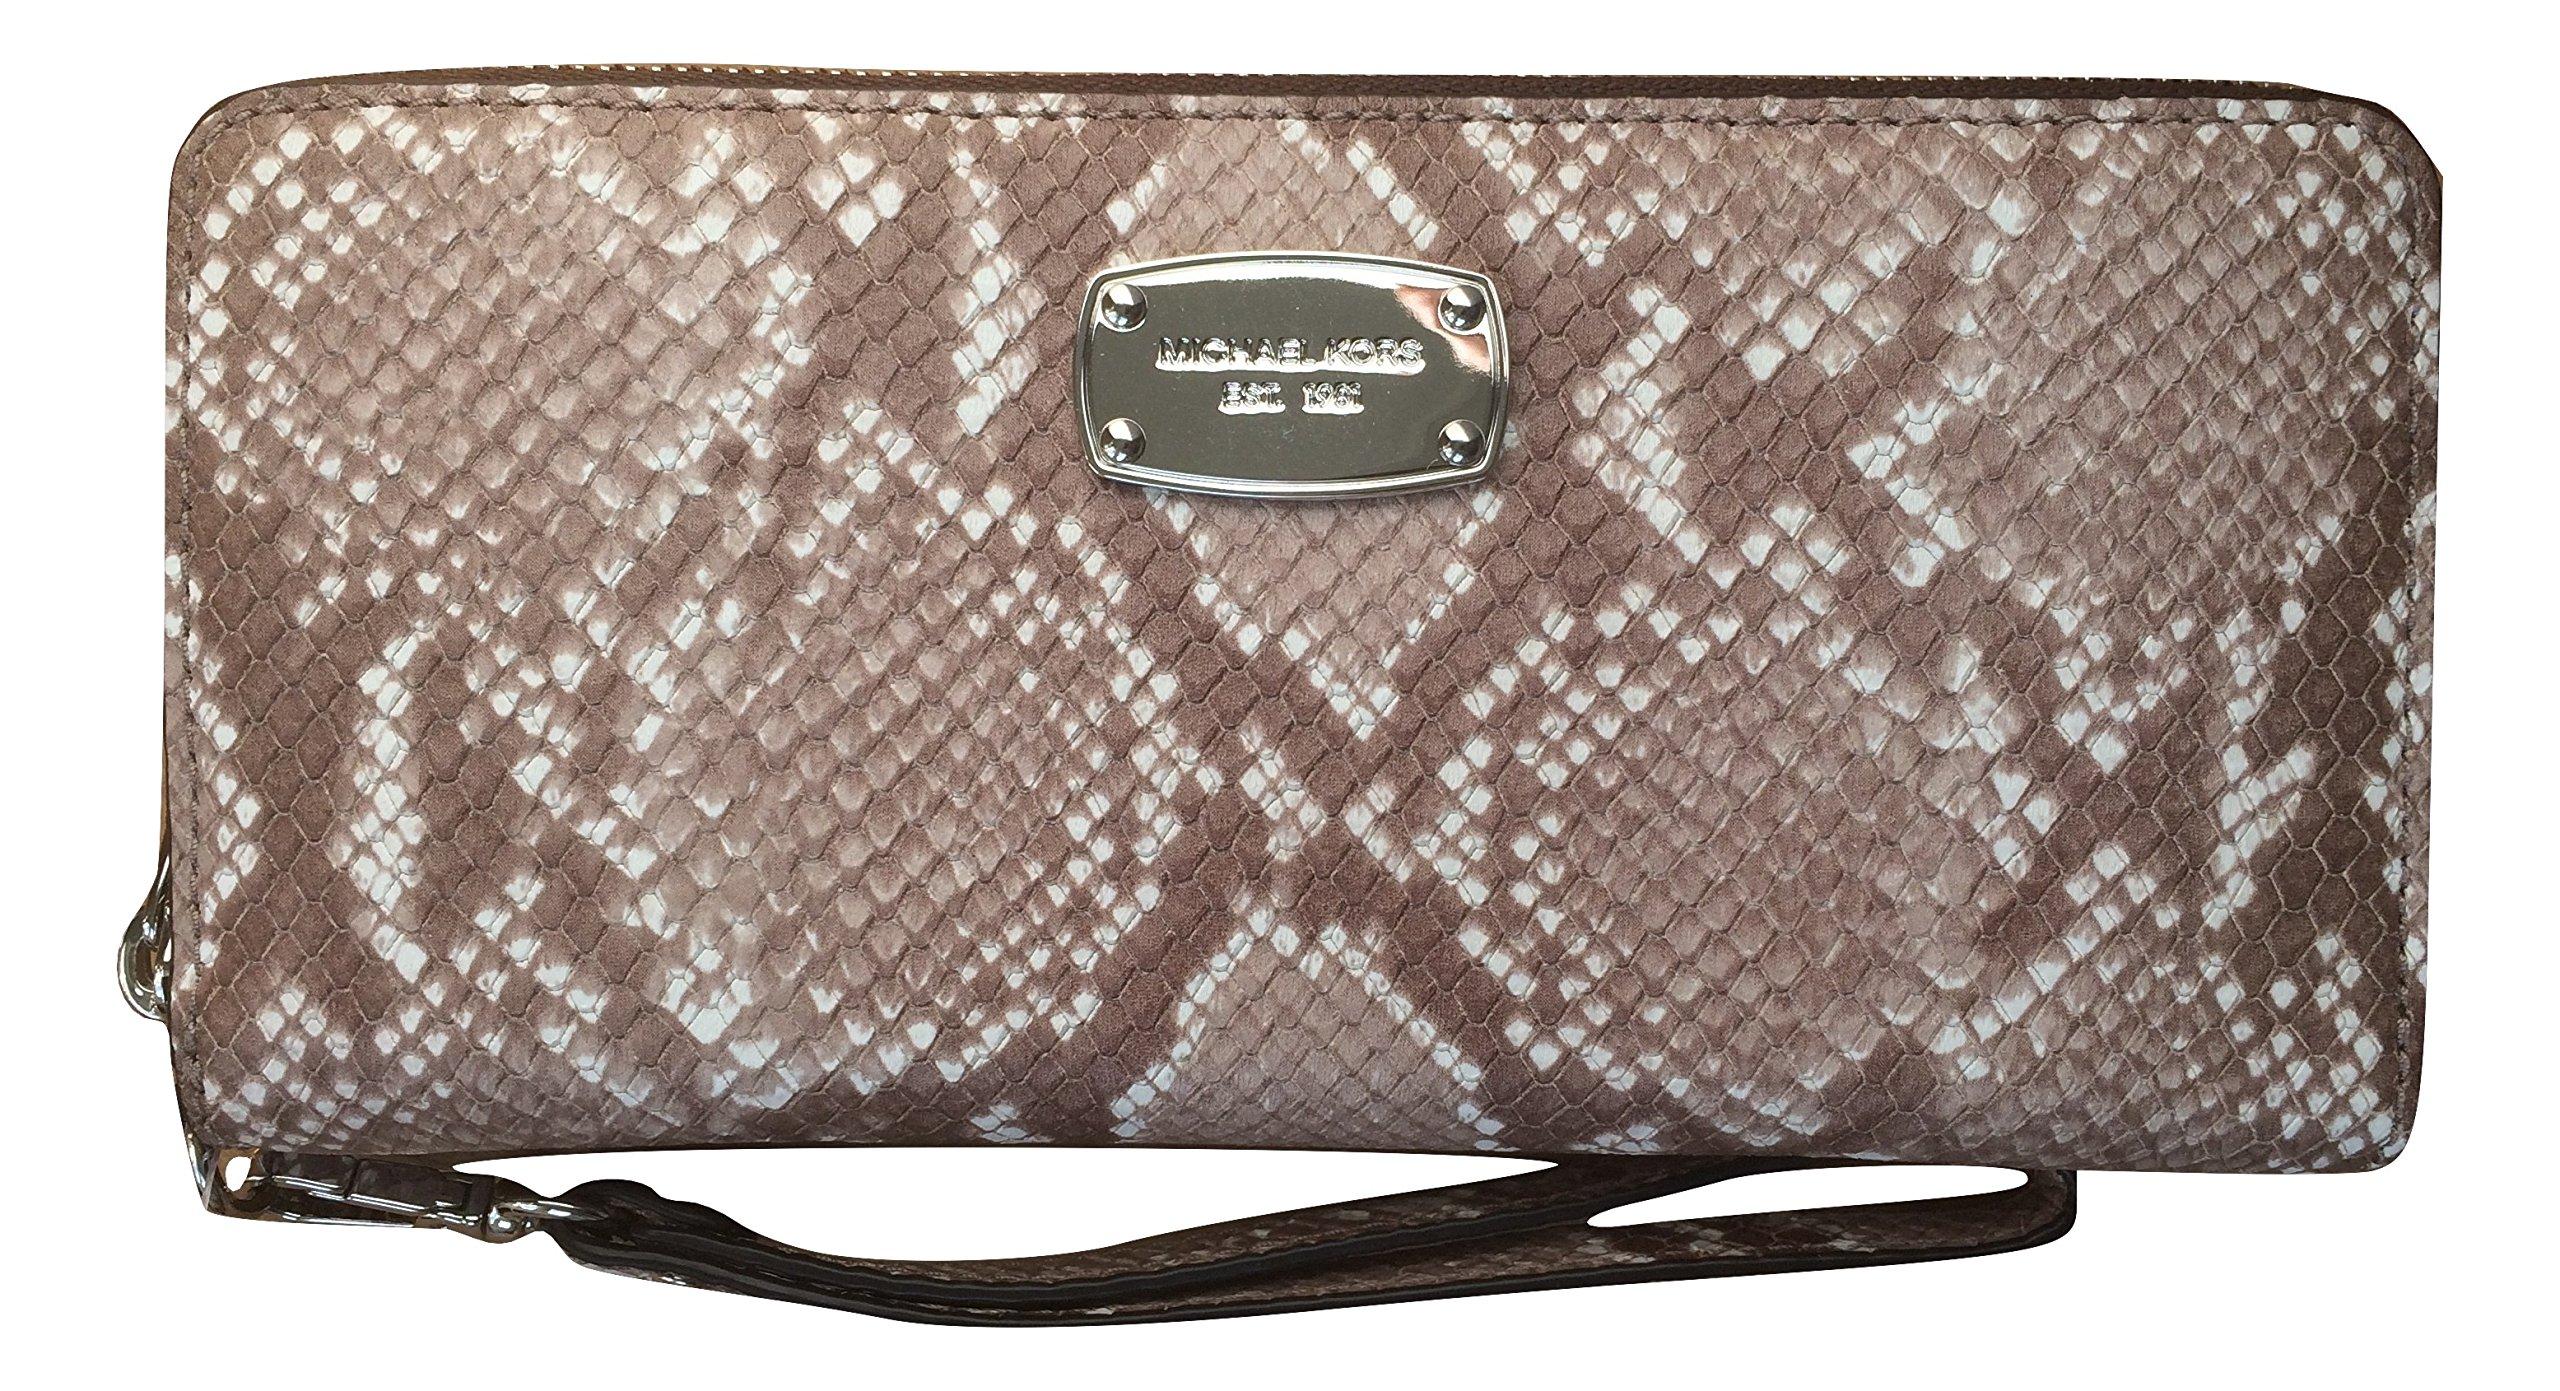 Michael Kors Leather Jet Set Travel Embossed Leather Continental Zip Around Wallet Wristlet (Dark Sand)